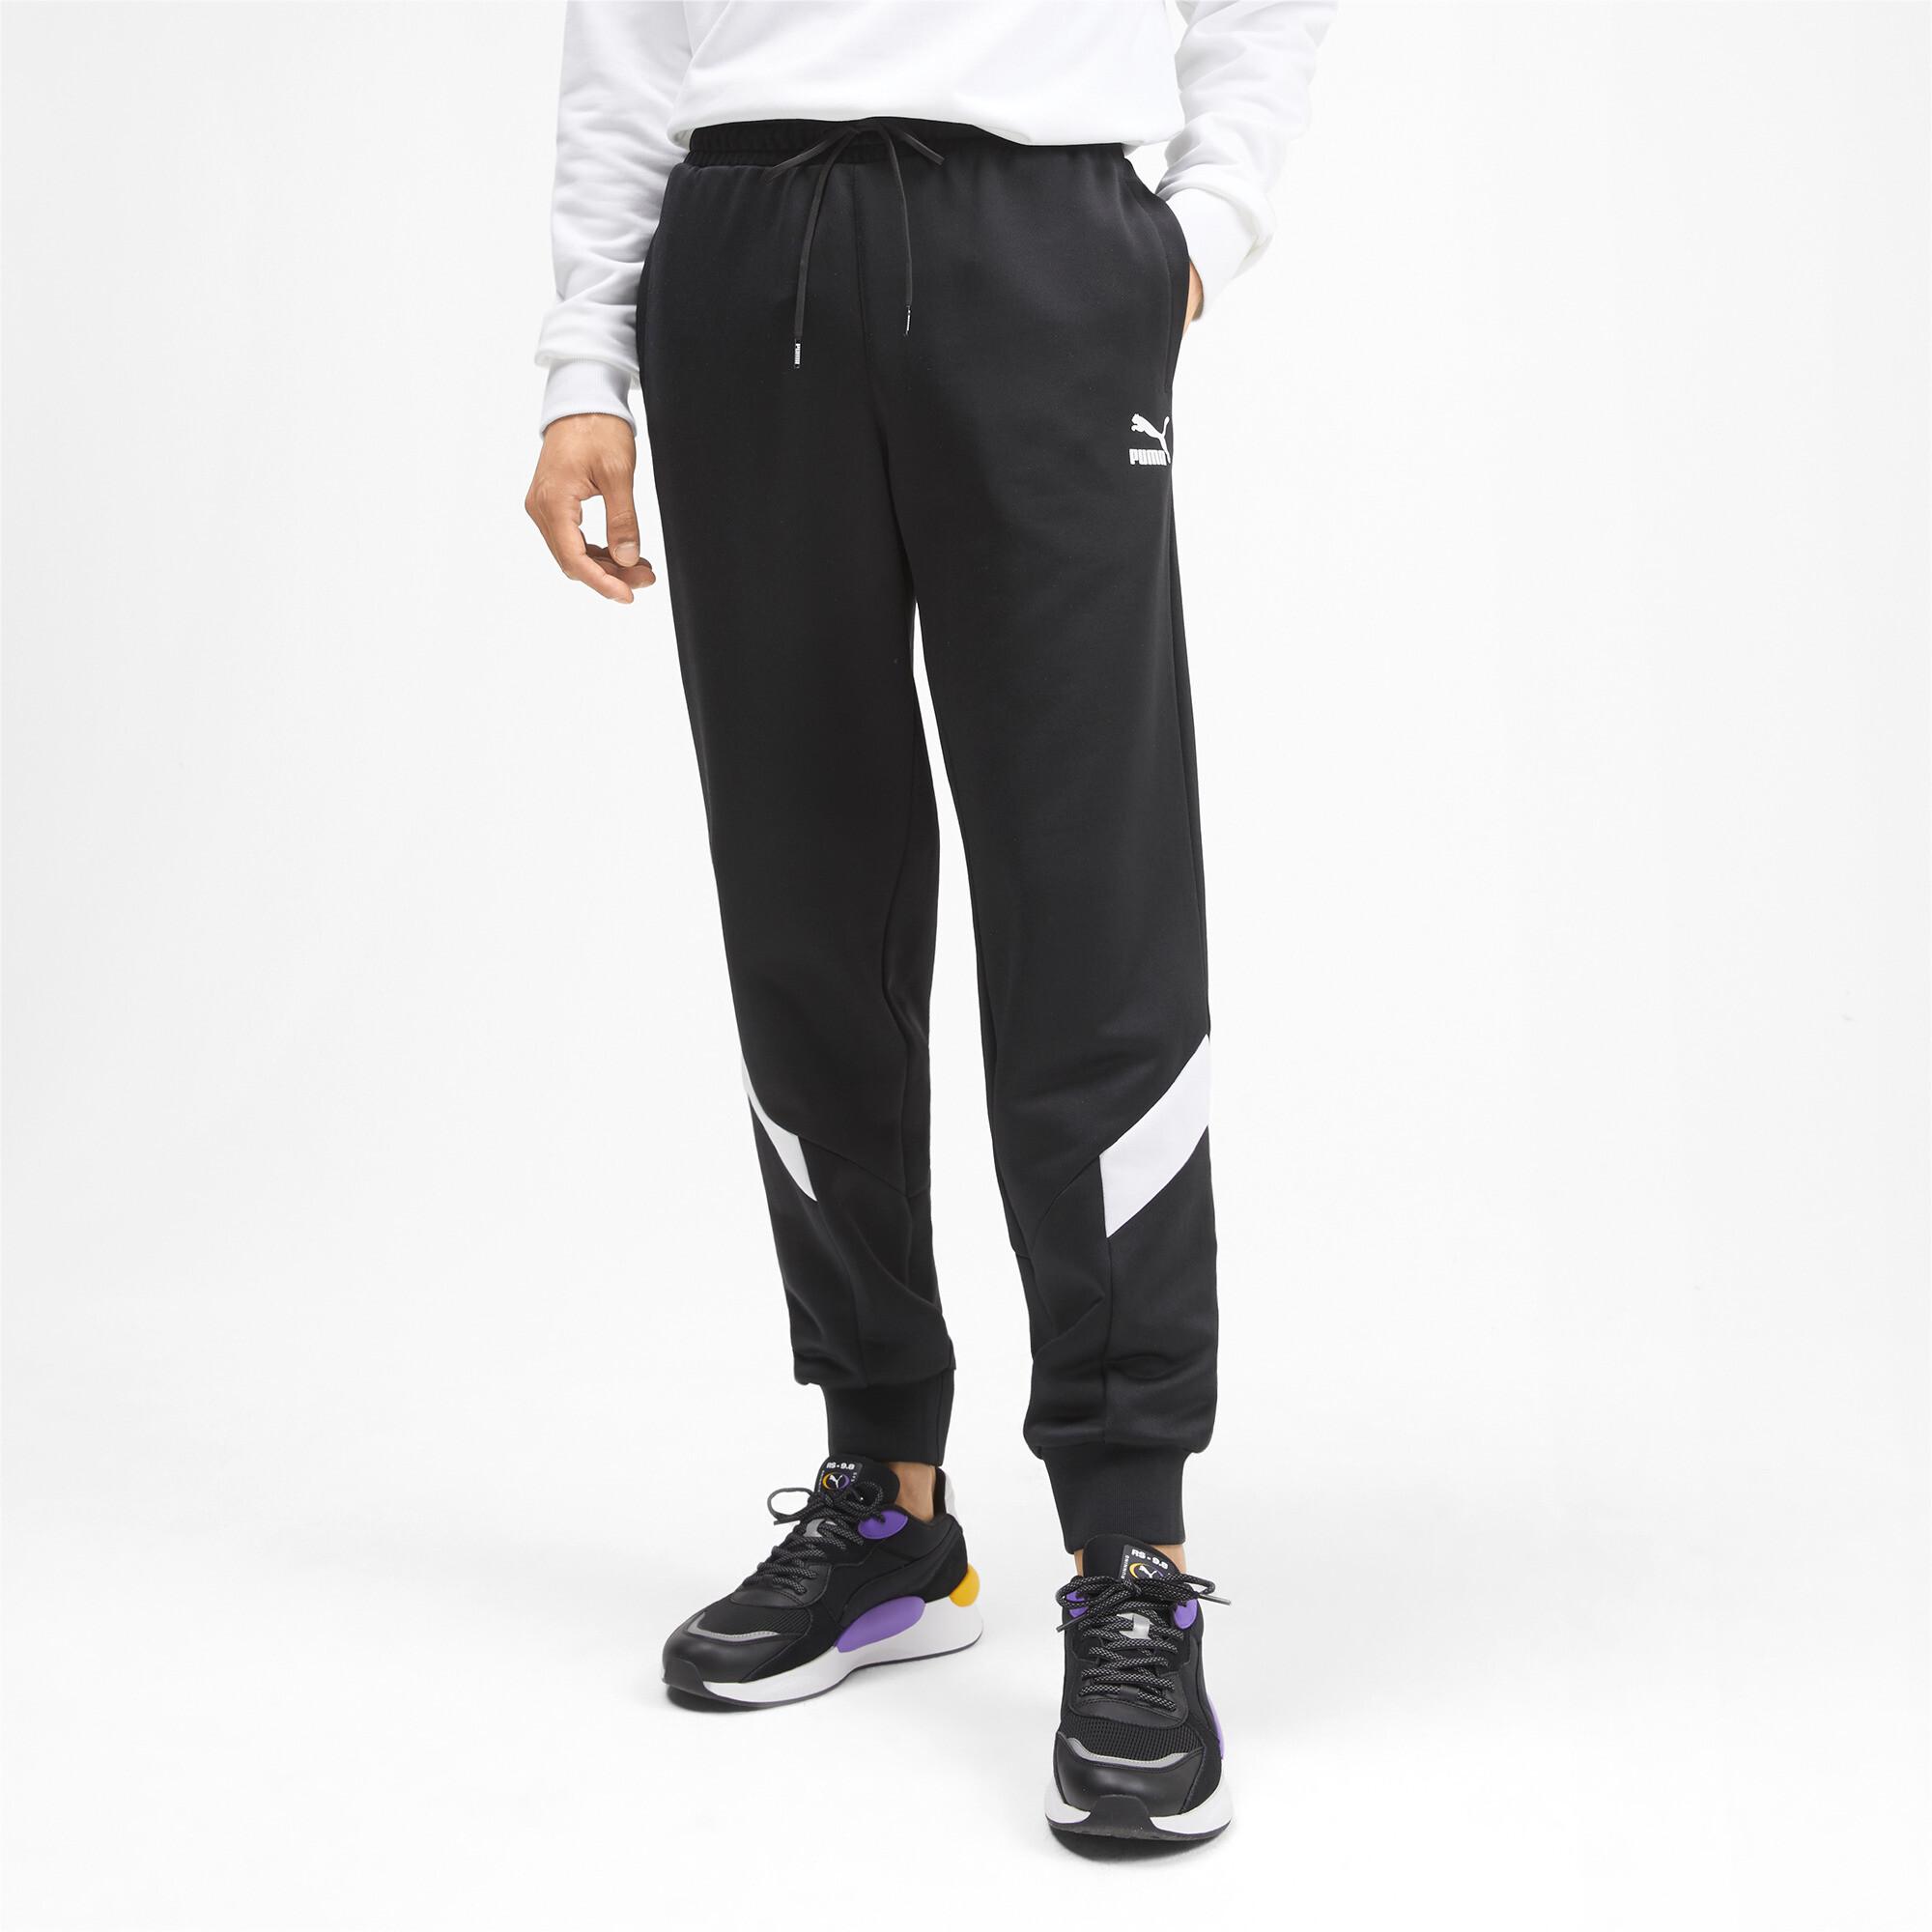 PUMA-Iconic-MCS-Men-039-s-Track-Pants-Men-Knitted-Pants-Sport-Classics thumbnail 9